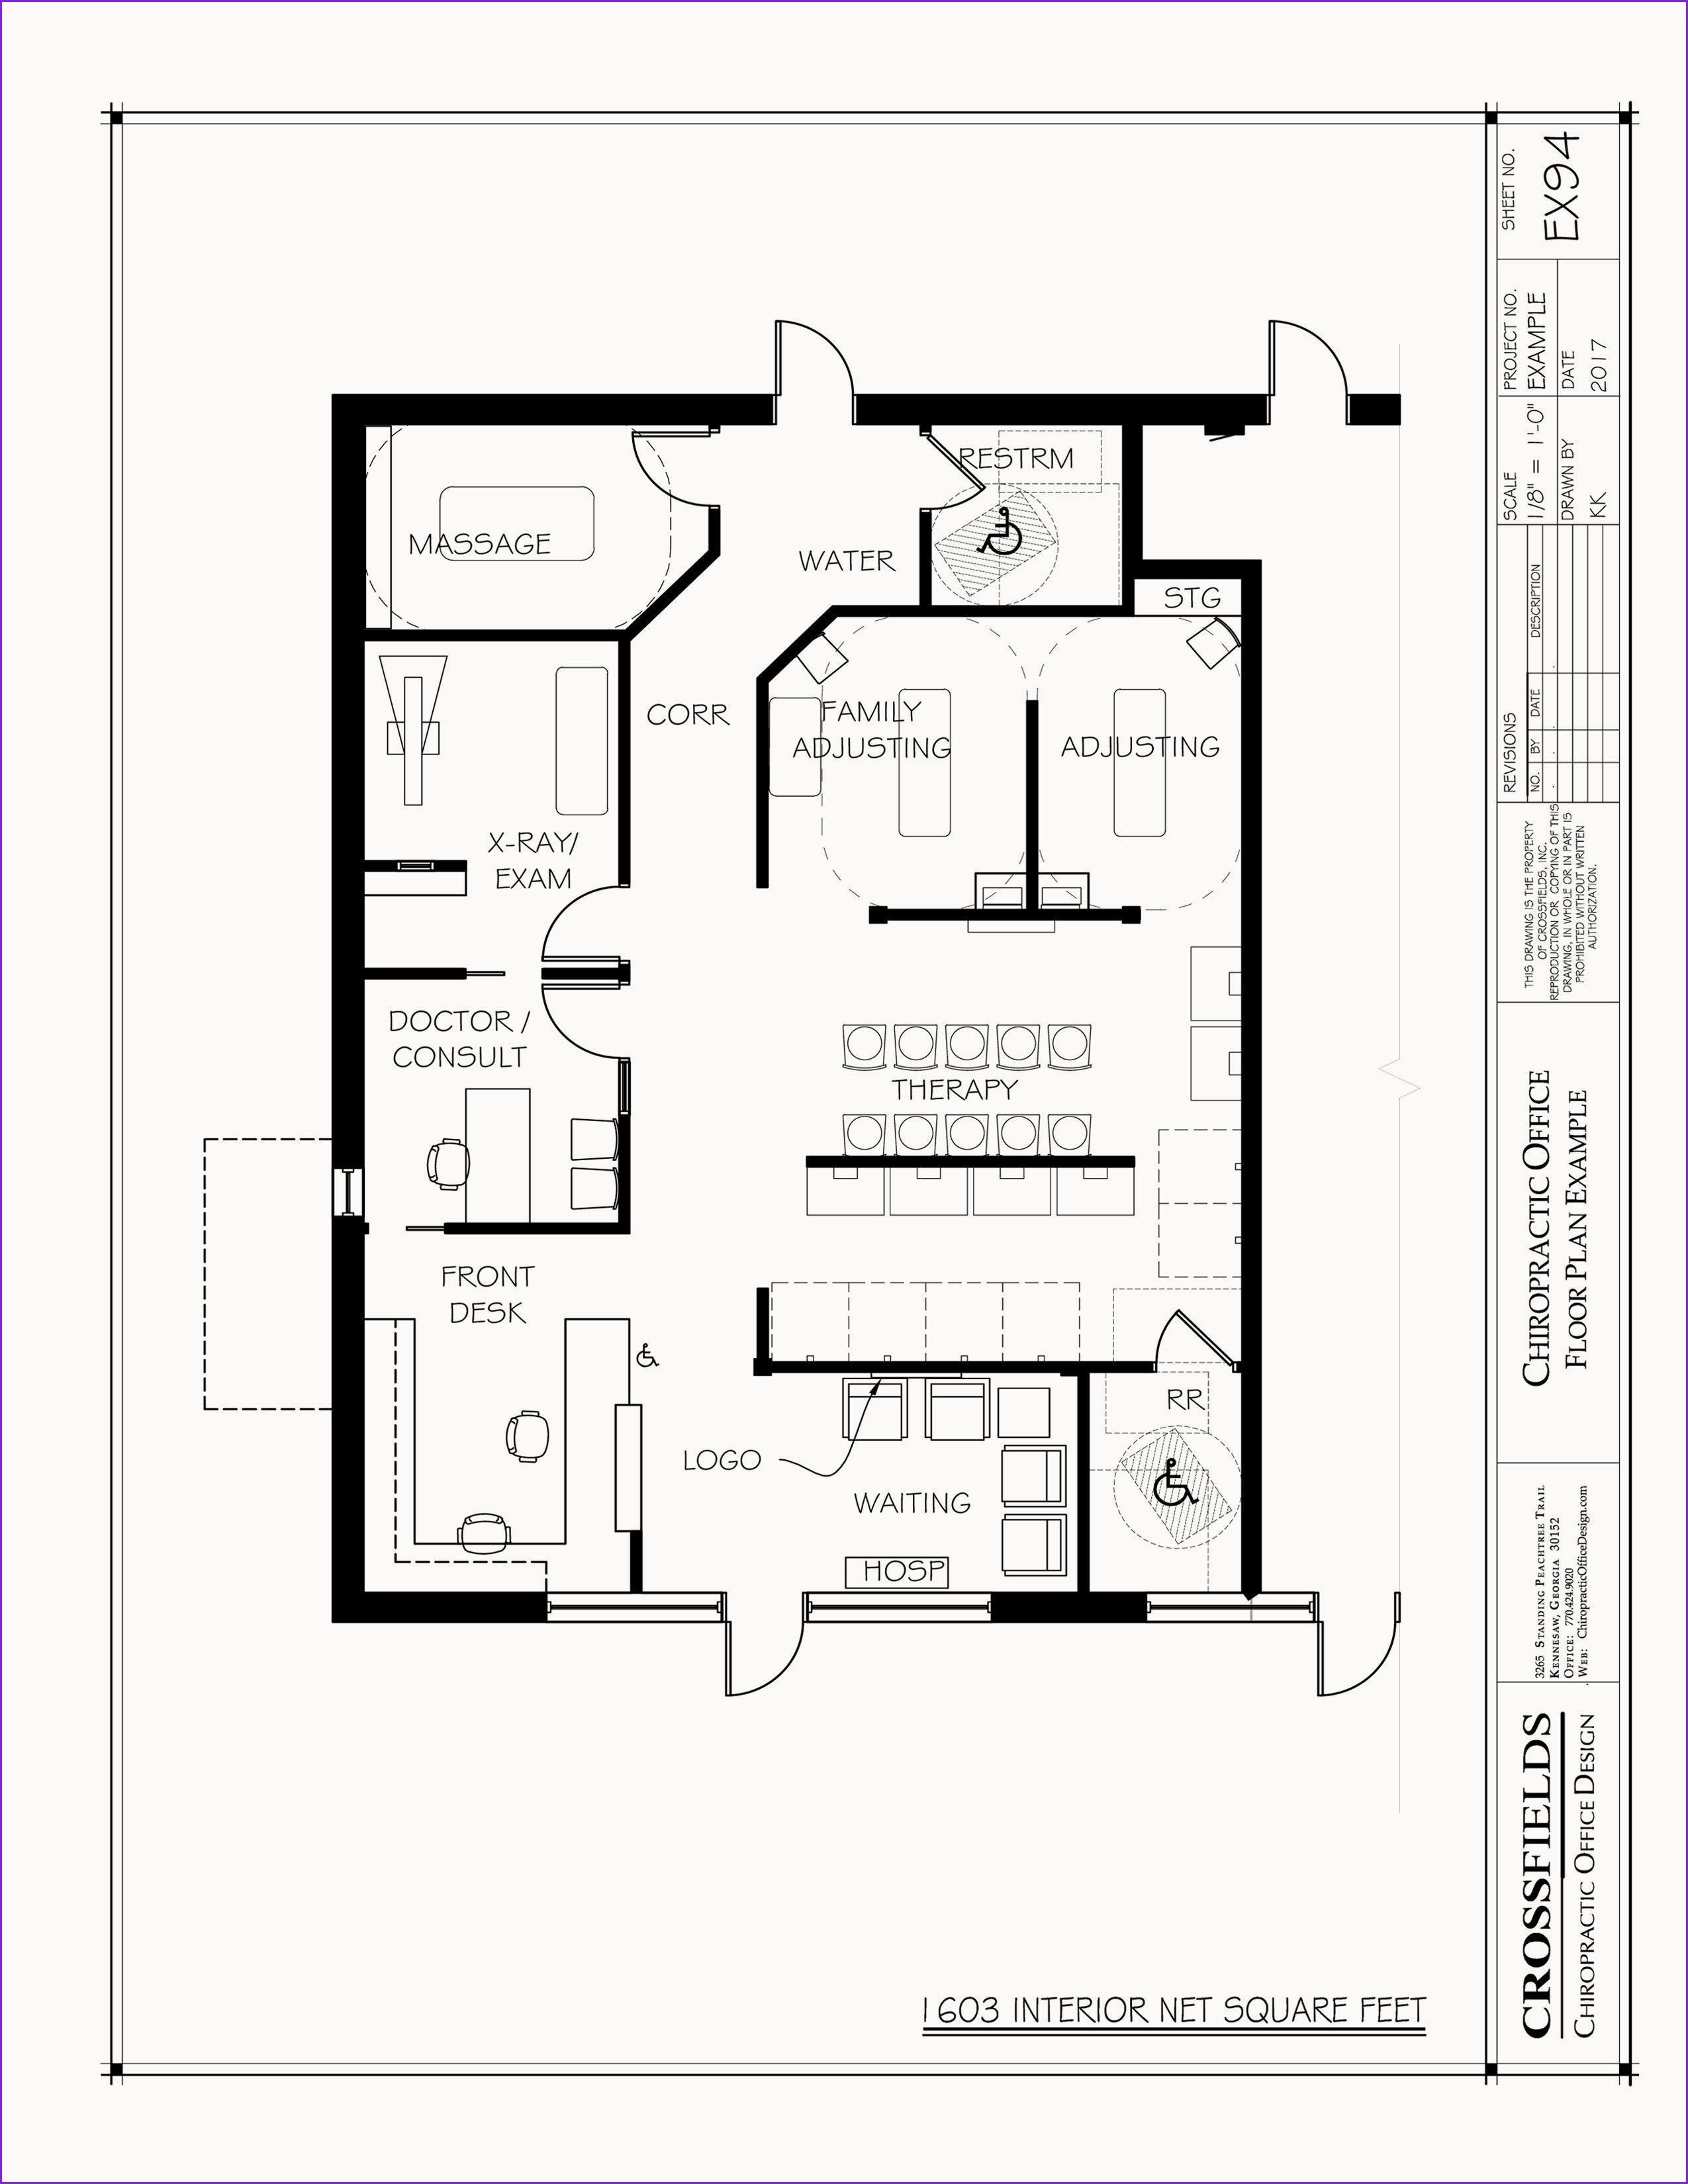 Awesome Lakefront Homes Floor Plans Floor Plan Design Floor Plan Layout Shop House Plans